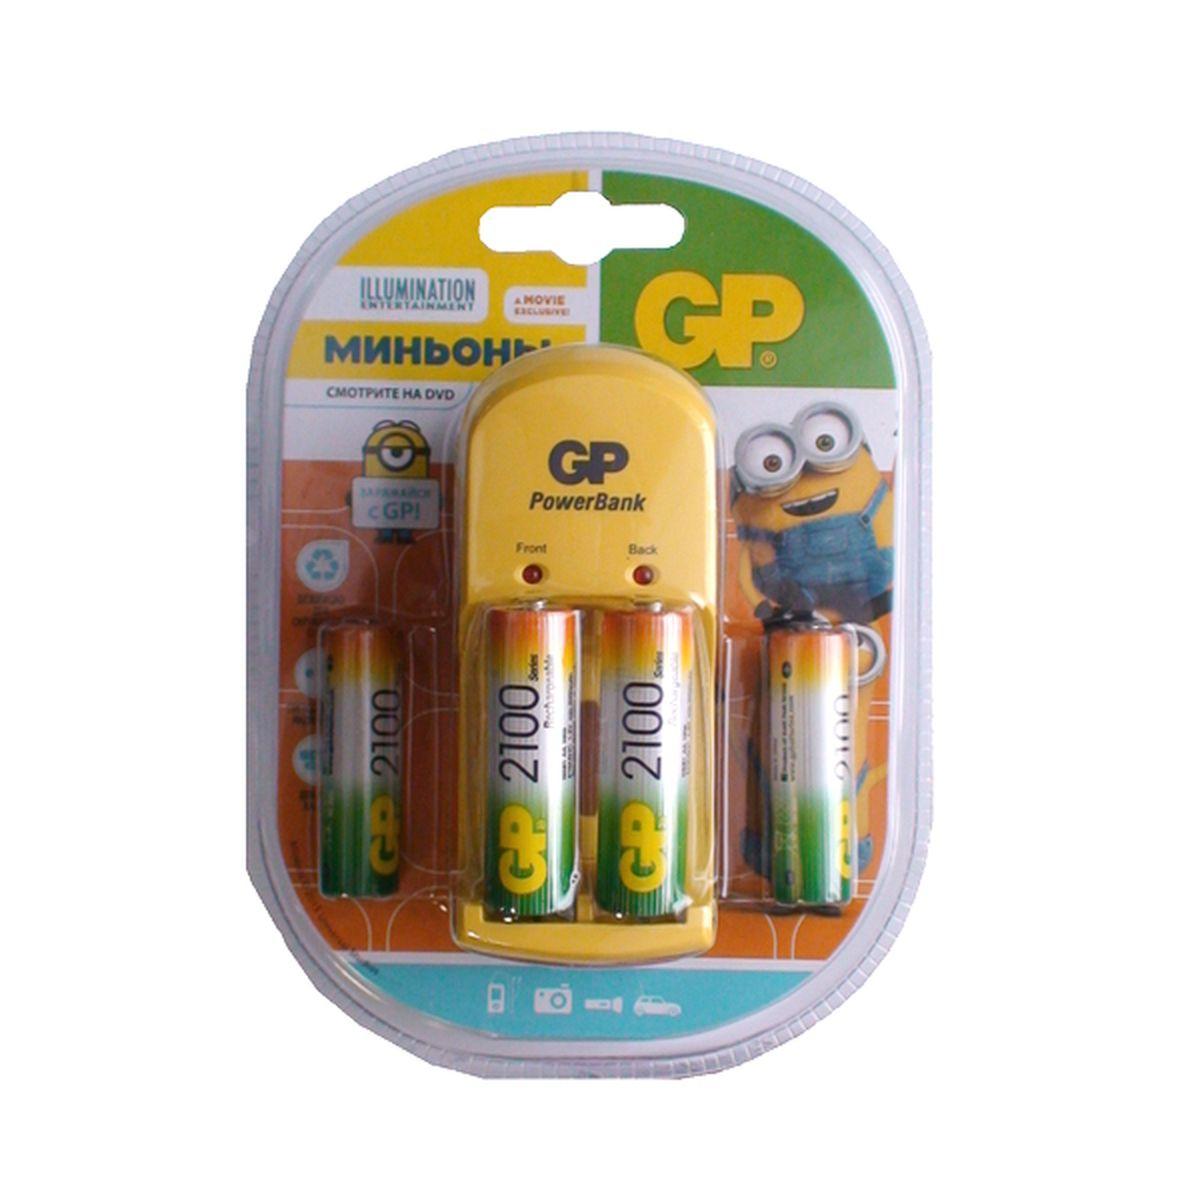 Зарядное устройство для аккумуляторов  GP Batteries  + 4 АА (2100 mAh) - Батарейки и аккумуляторы